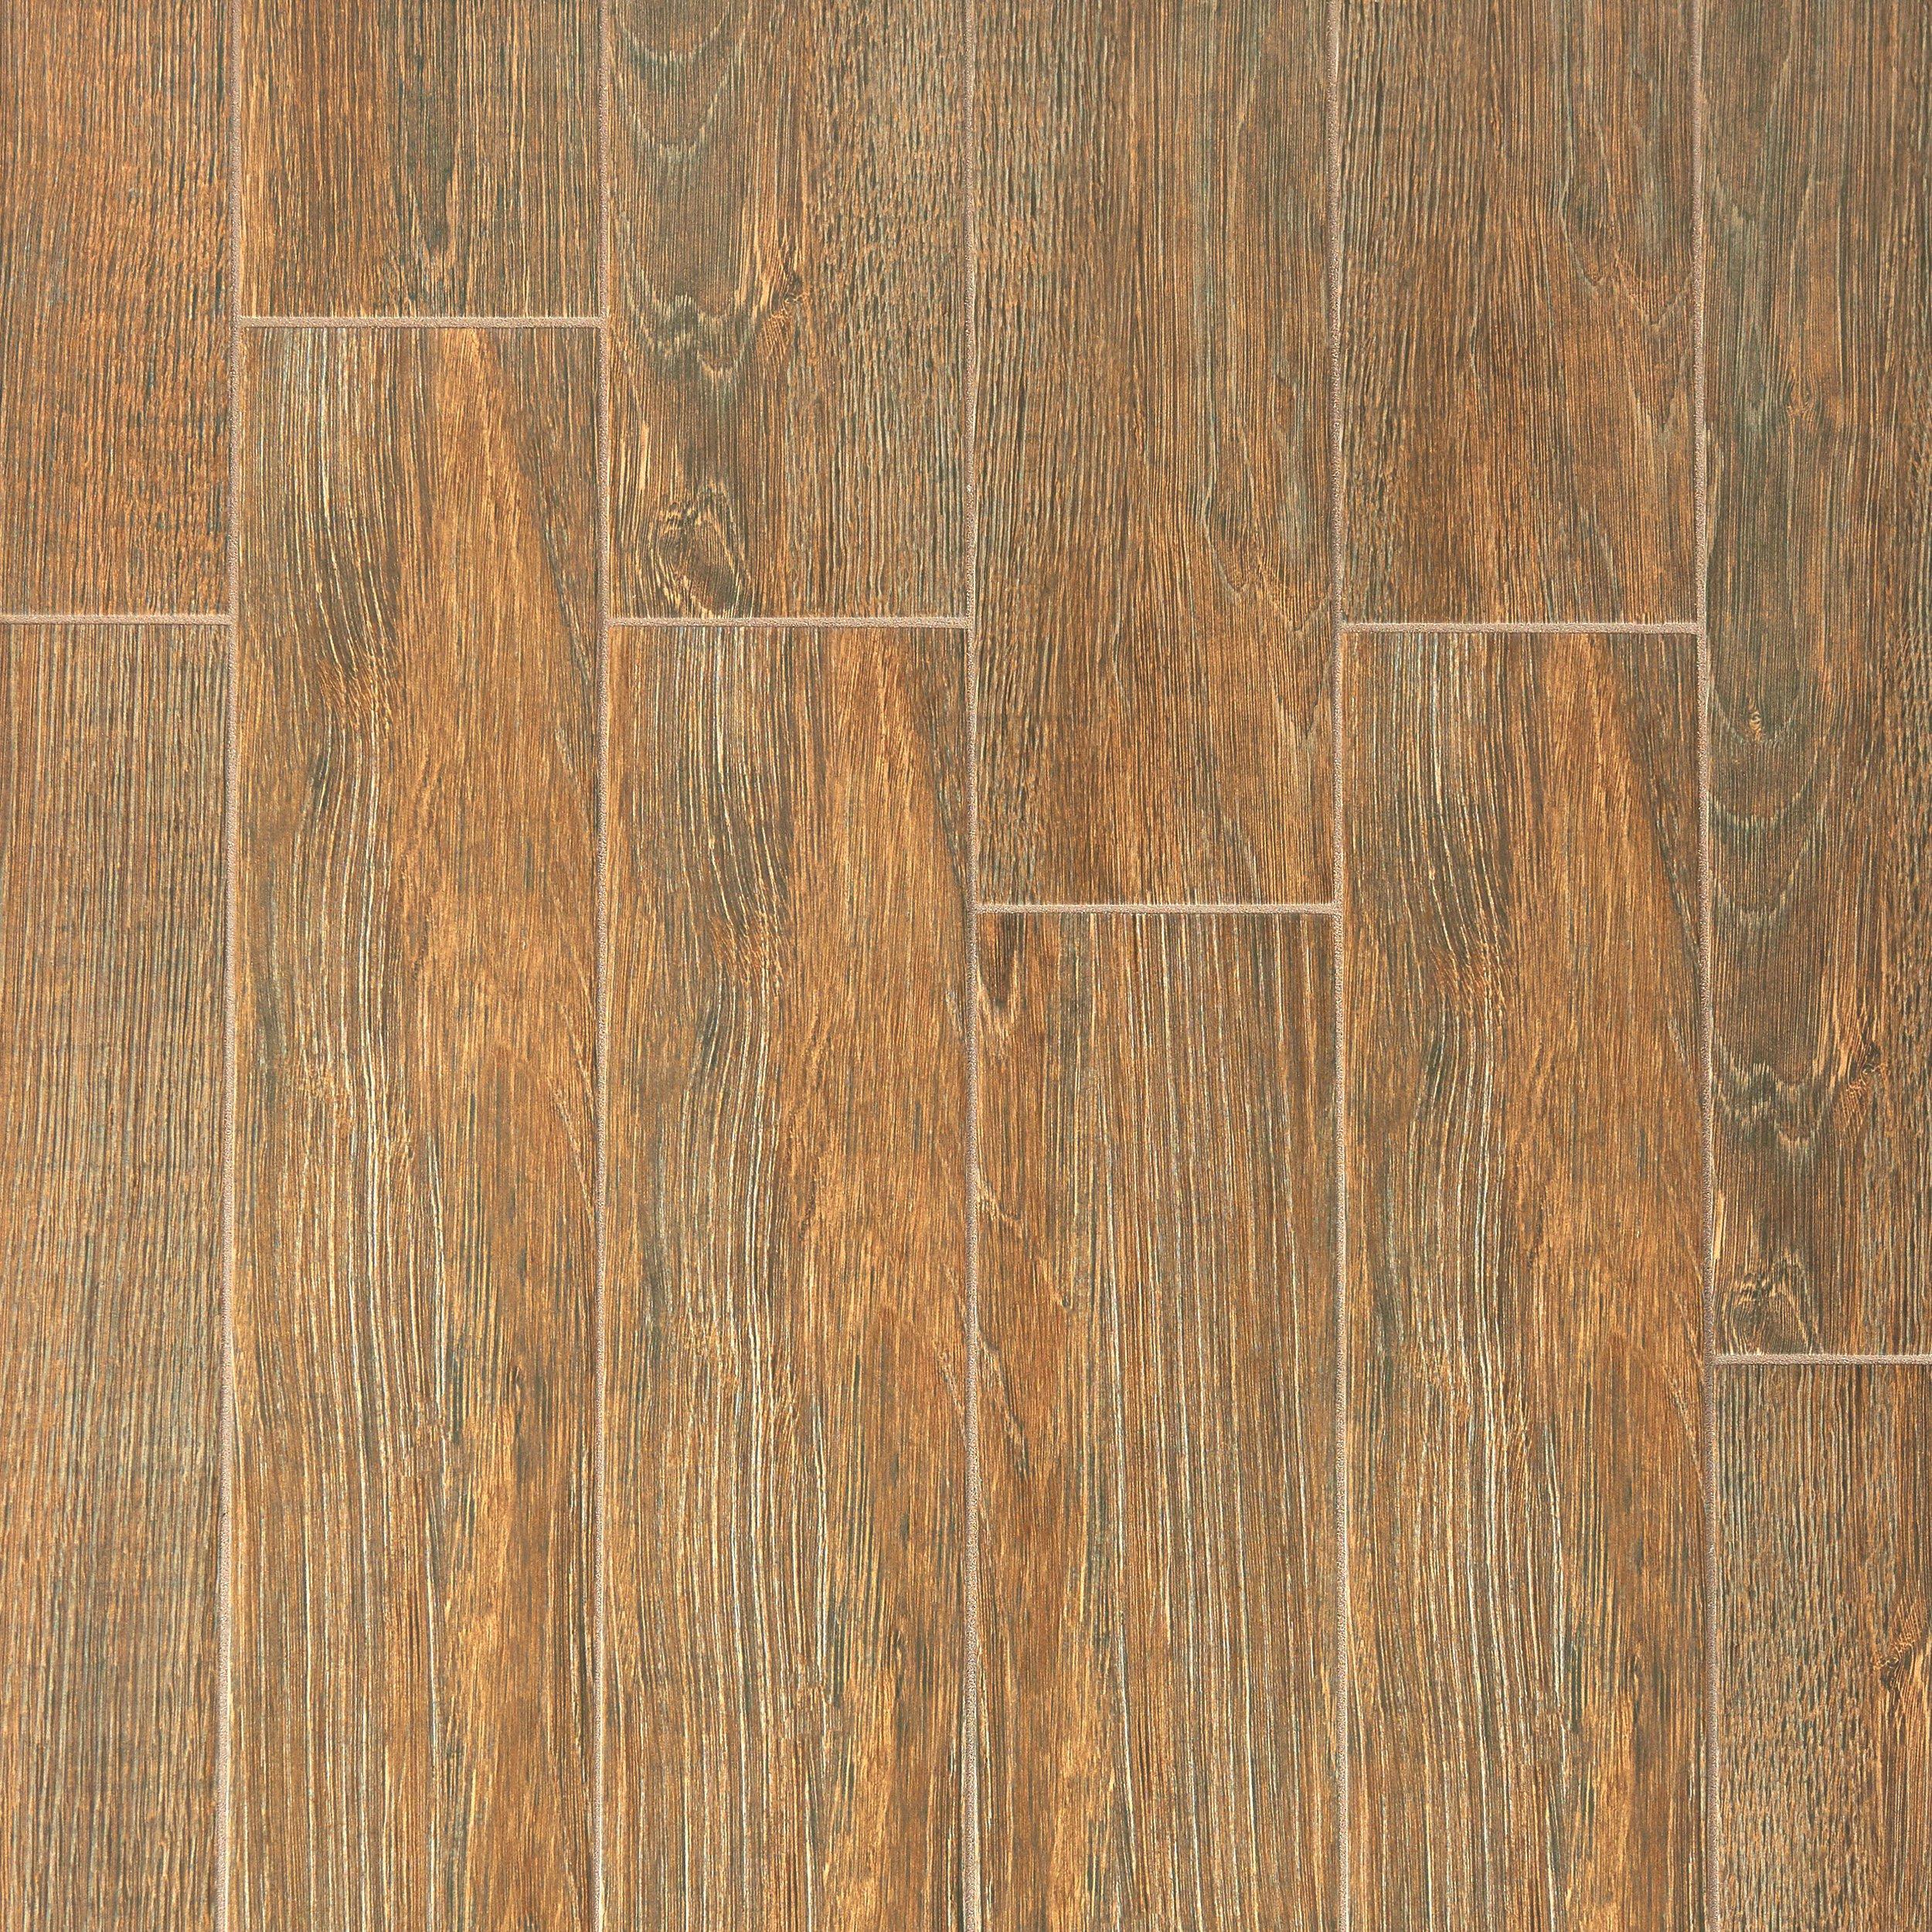 prospect ridge wood plank porcelain